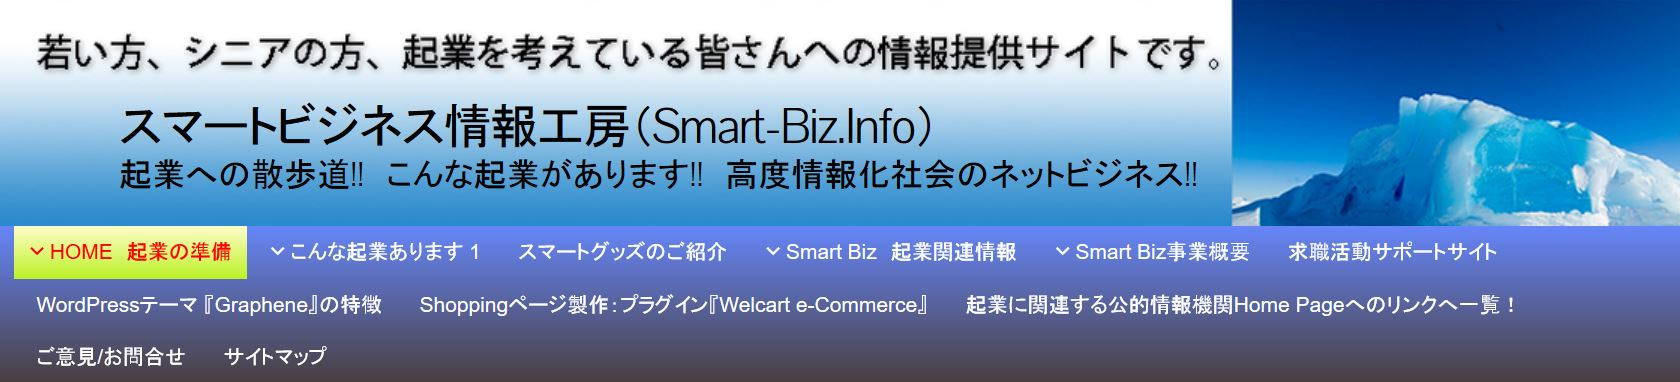 Smart Biz JPEG